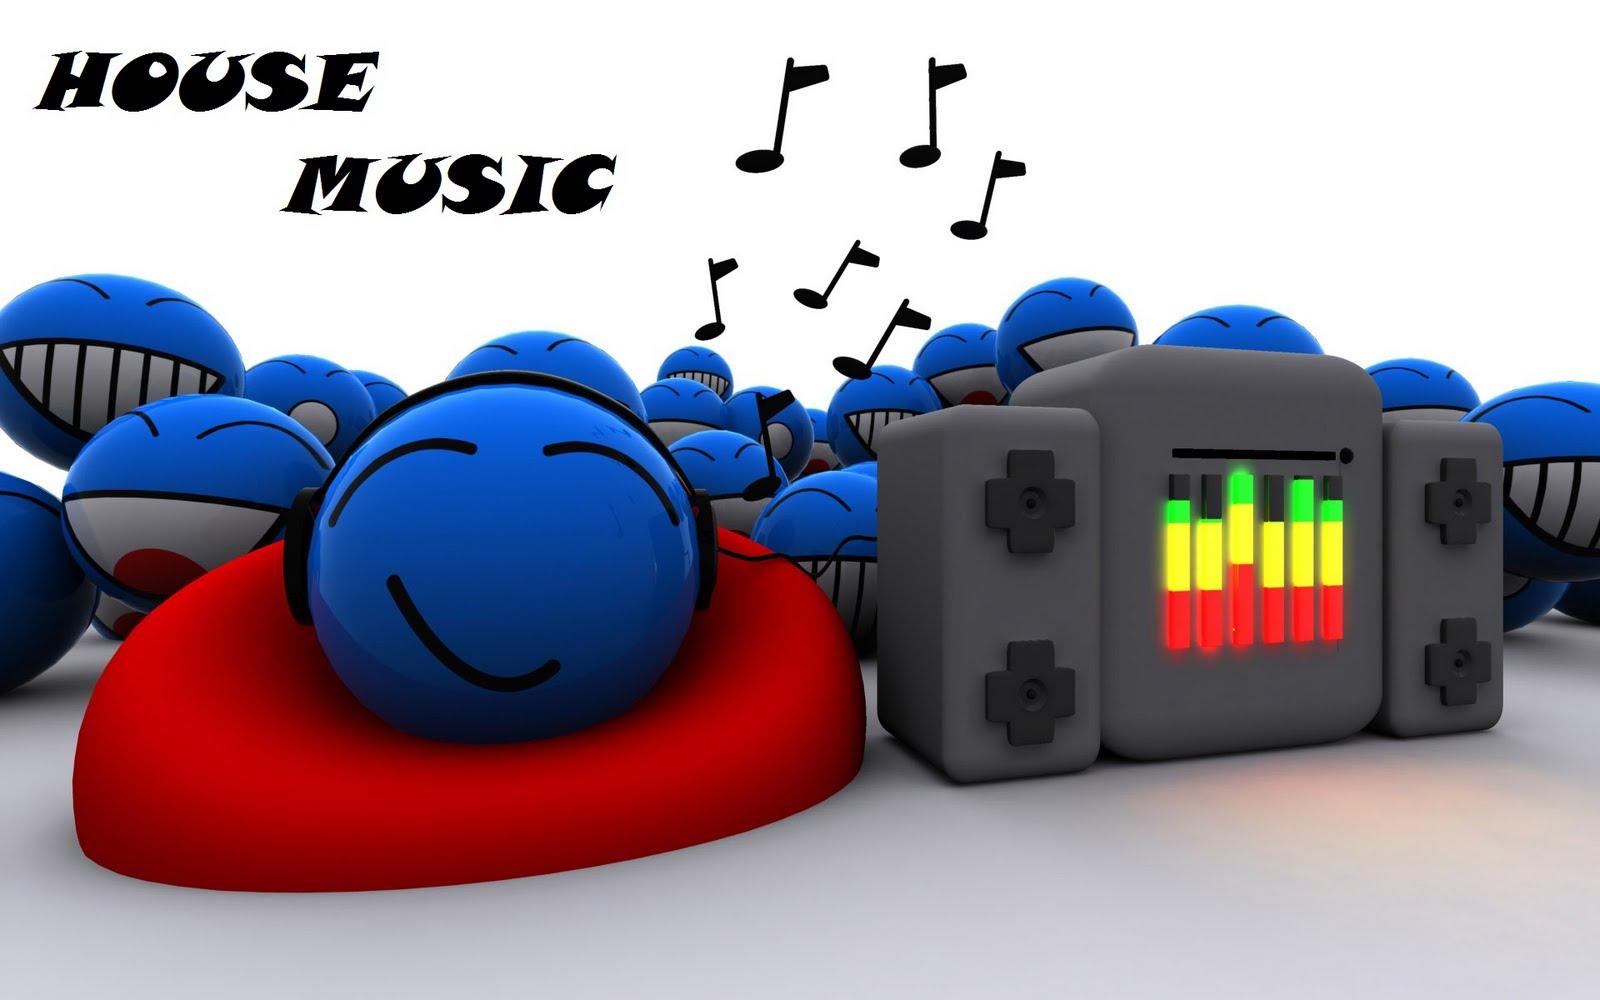 M i k 2 5 8 0 musica online house music for Funky house music